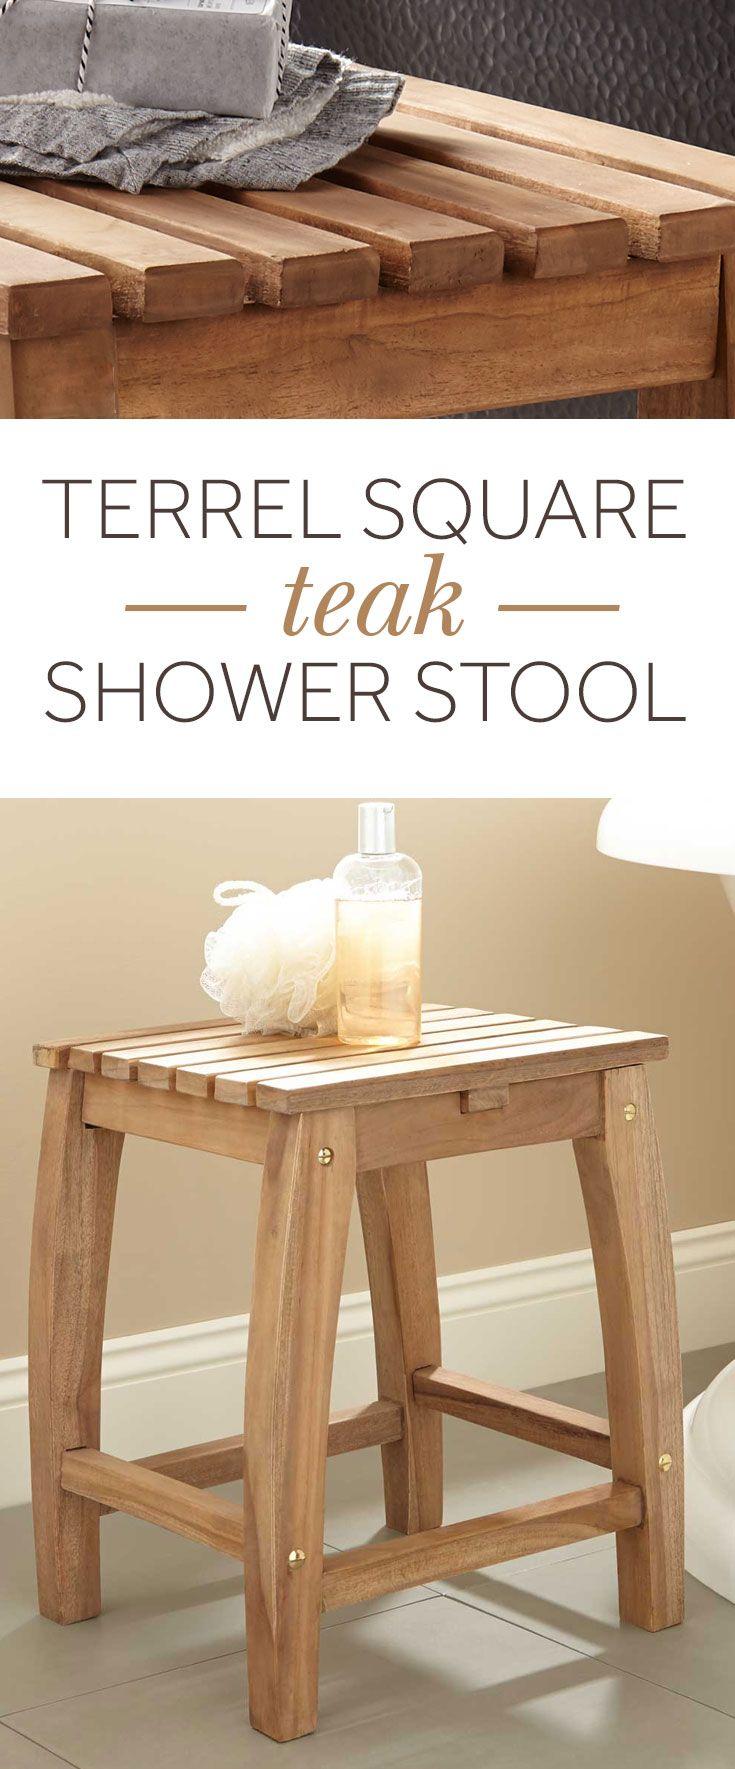 Best 25+ Teak shower stool ideas on Pinterest | Compton news ...